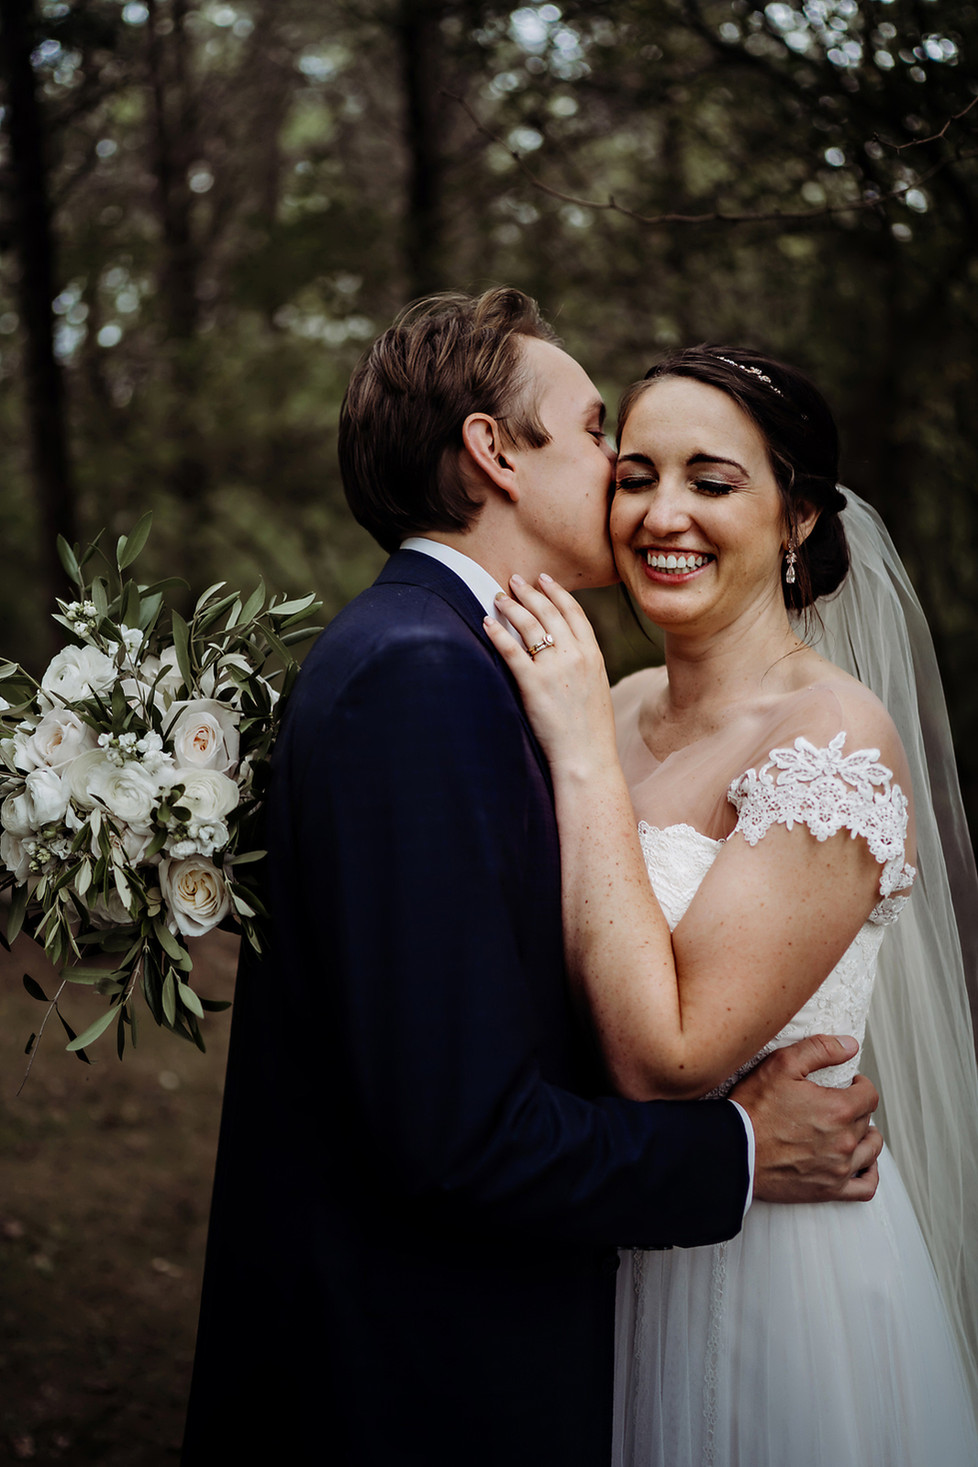 Travis + Paige || Wedding at Cedar Spring Pavilion